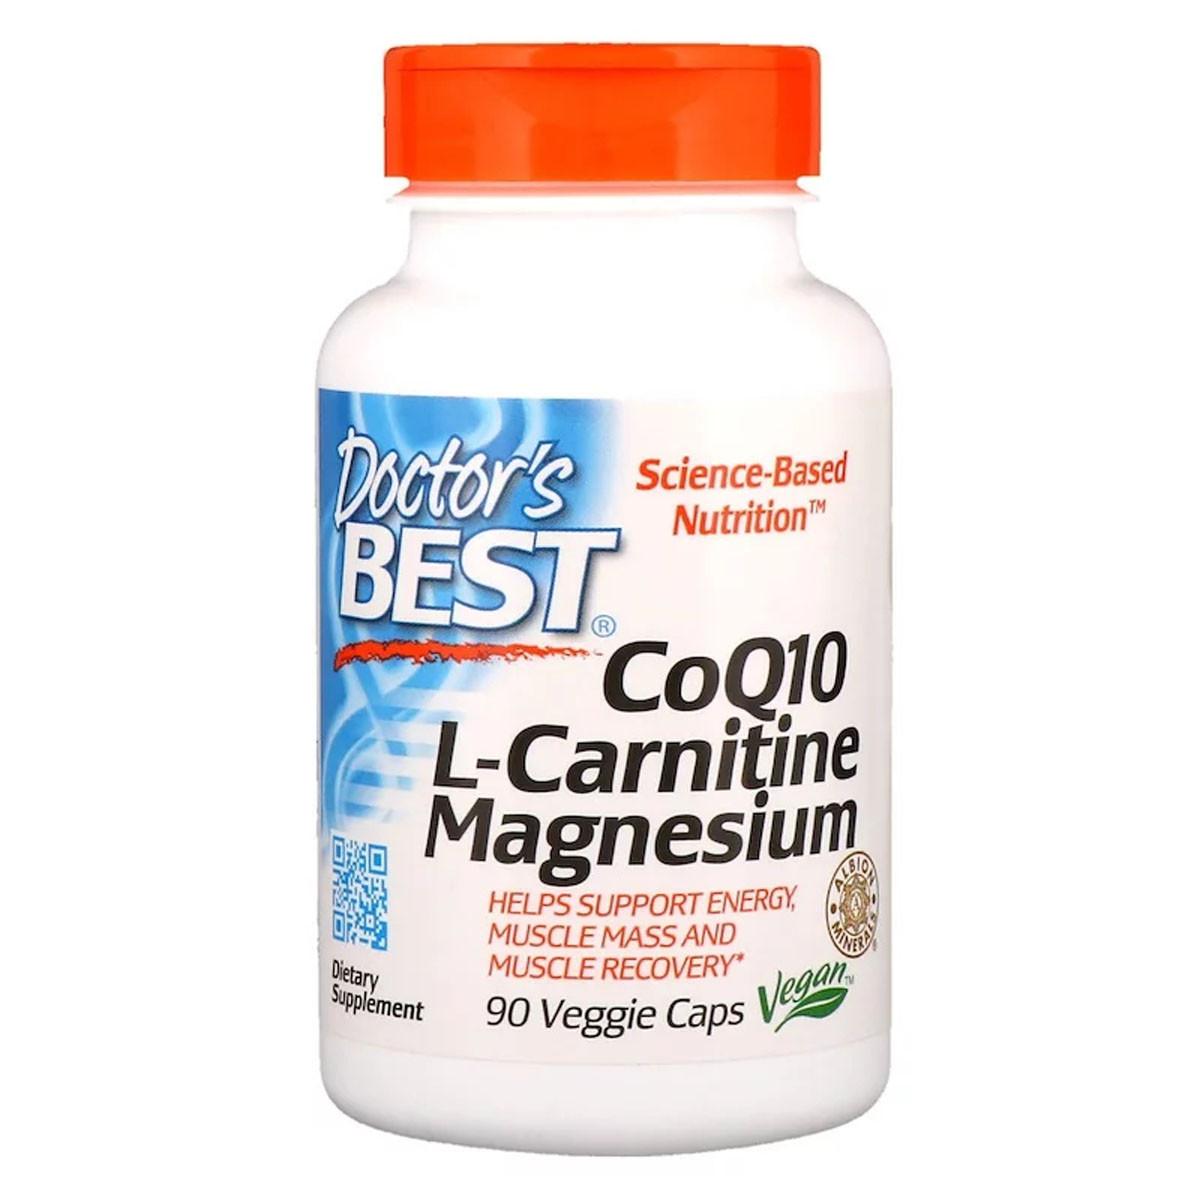 Коэнзим Q10, L-Карнитин и Магний, CoQ10 L-Carnitine Magnesium, Doctor's Best, 90 капсул